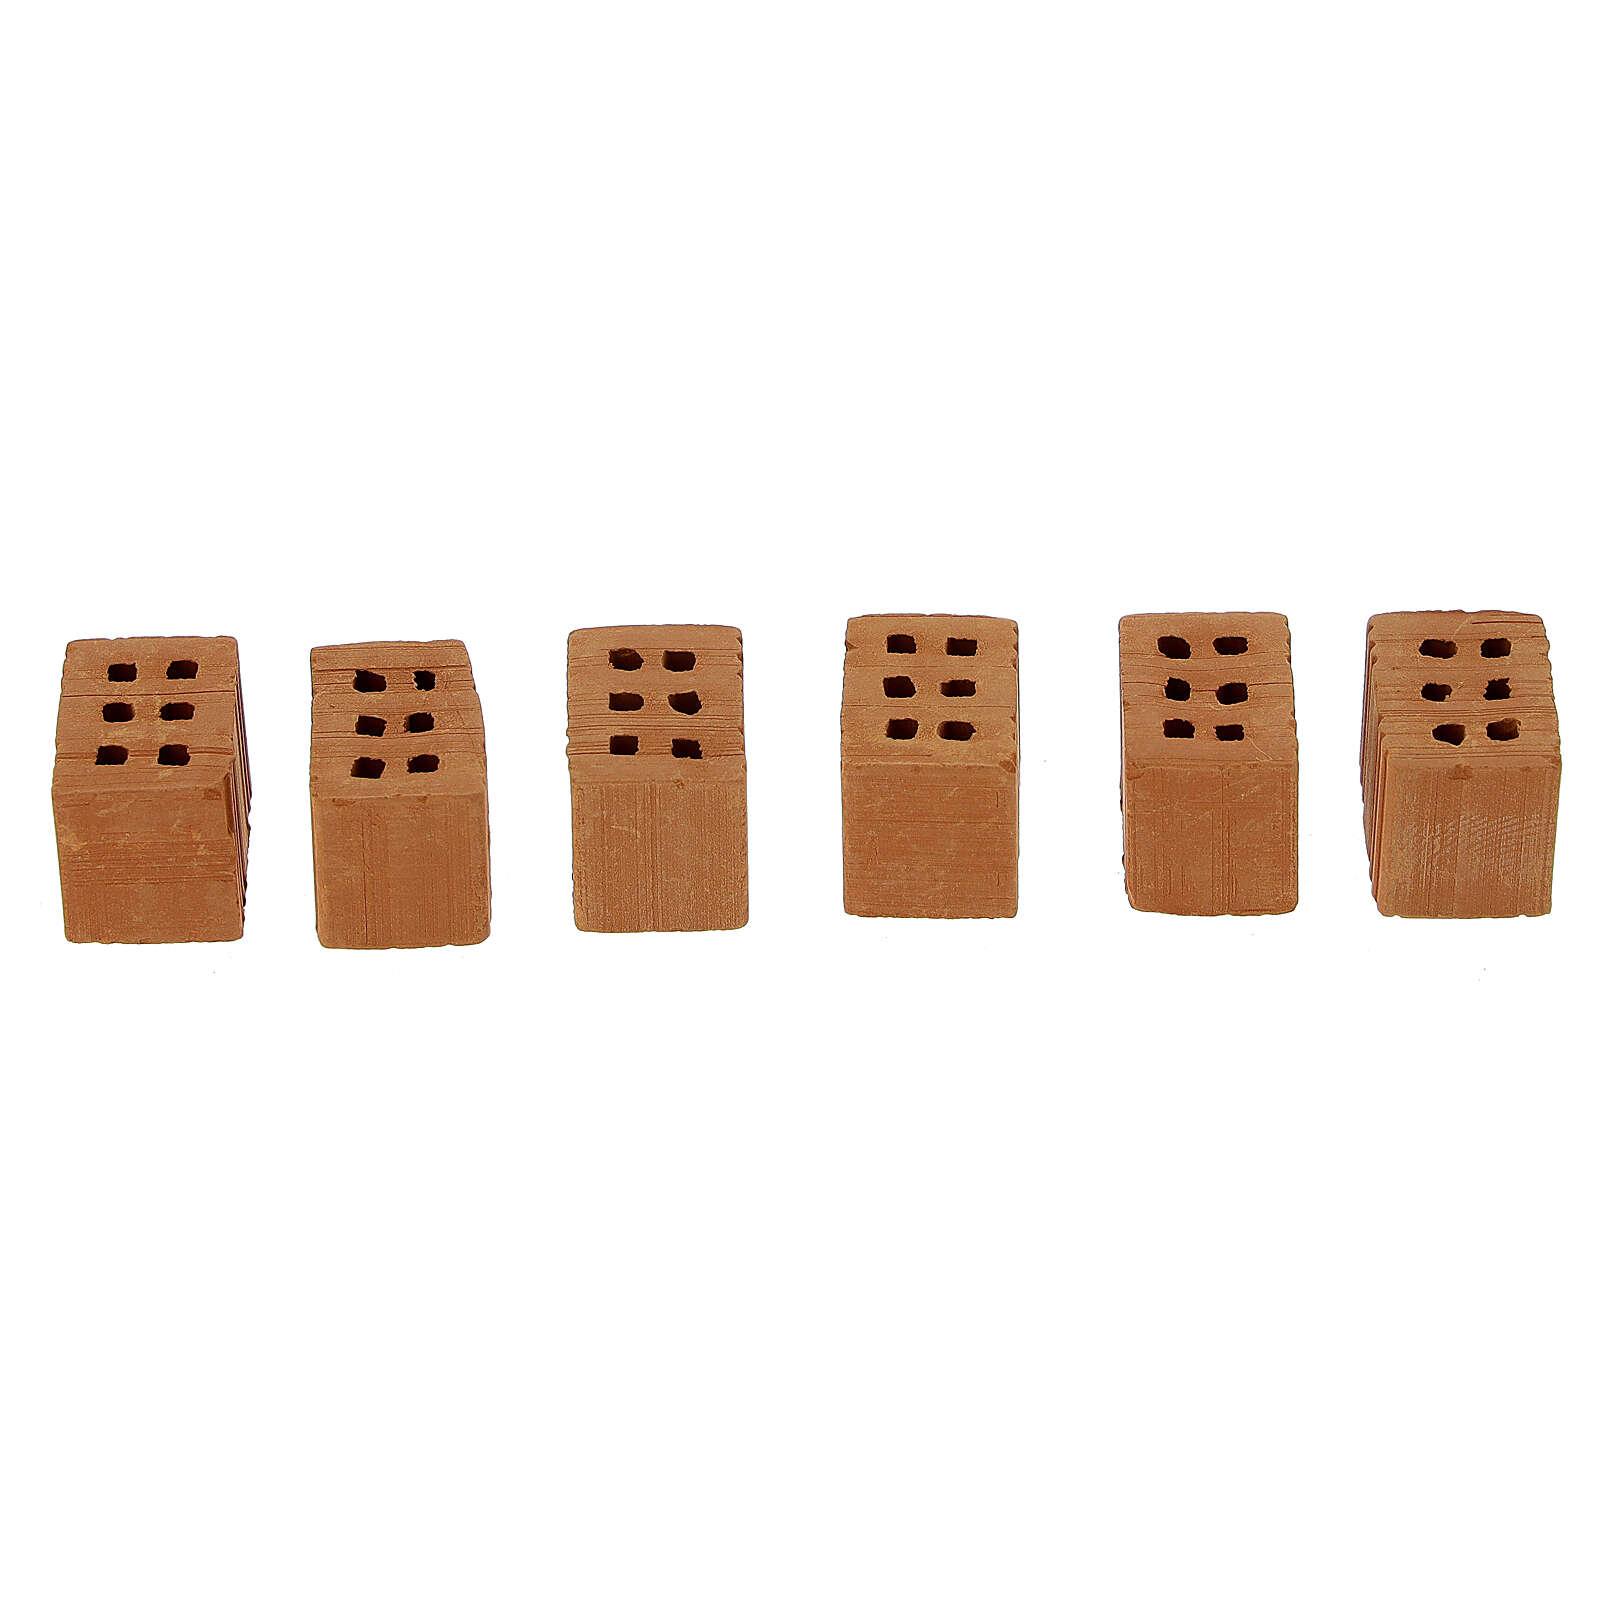 Terracotta bricks 1x1,5x1 cm 100 pieces for Nativity Scene 4